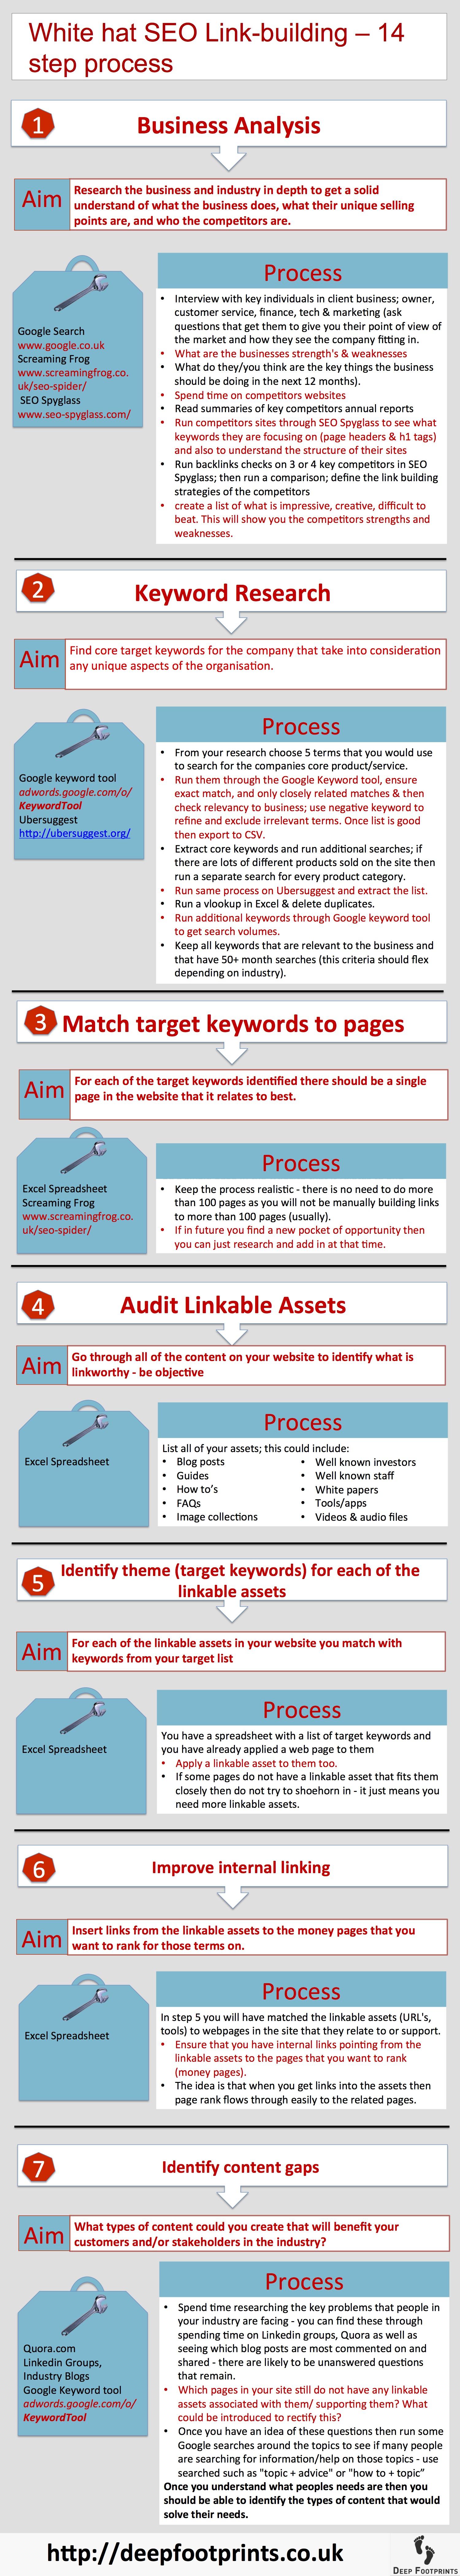 SEO linkbuilding 14 step guide part 1